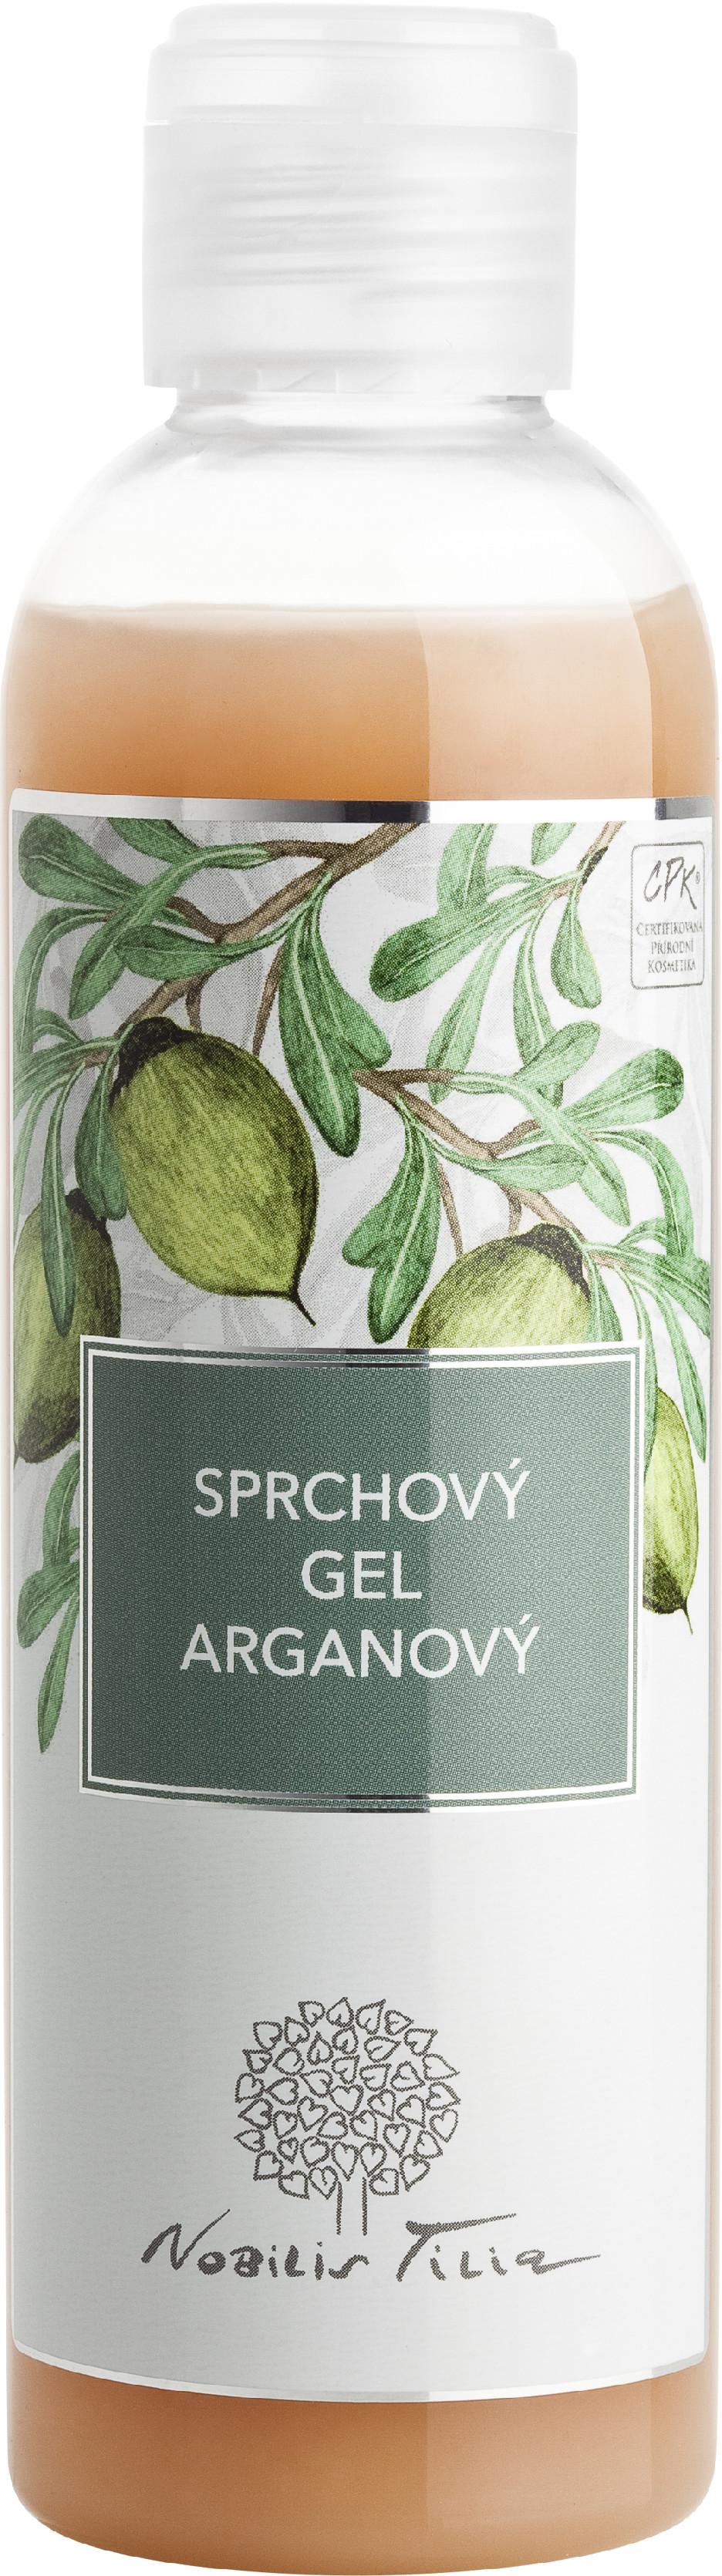 Nobilis Tilia Nobilis, Sprchový gel Arganový 200ml